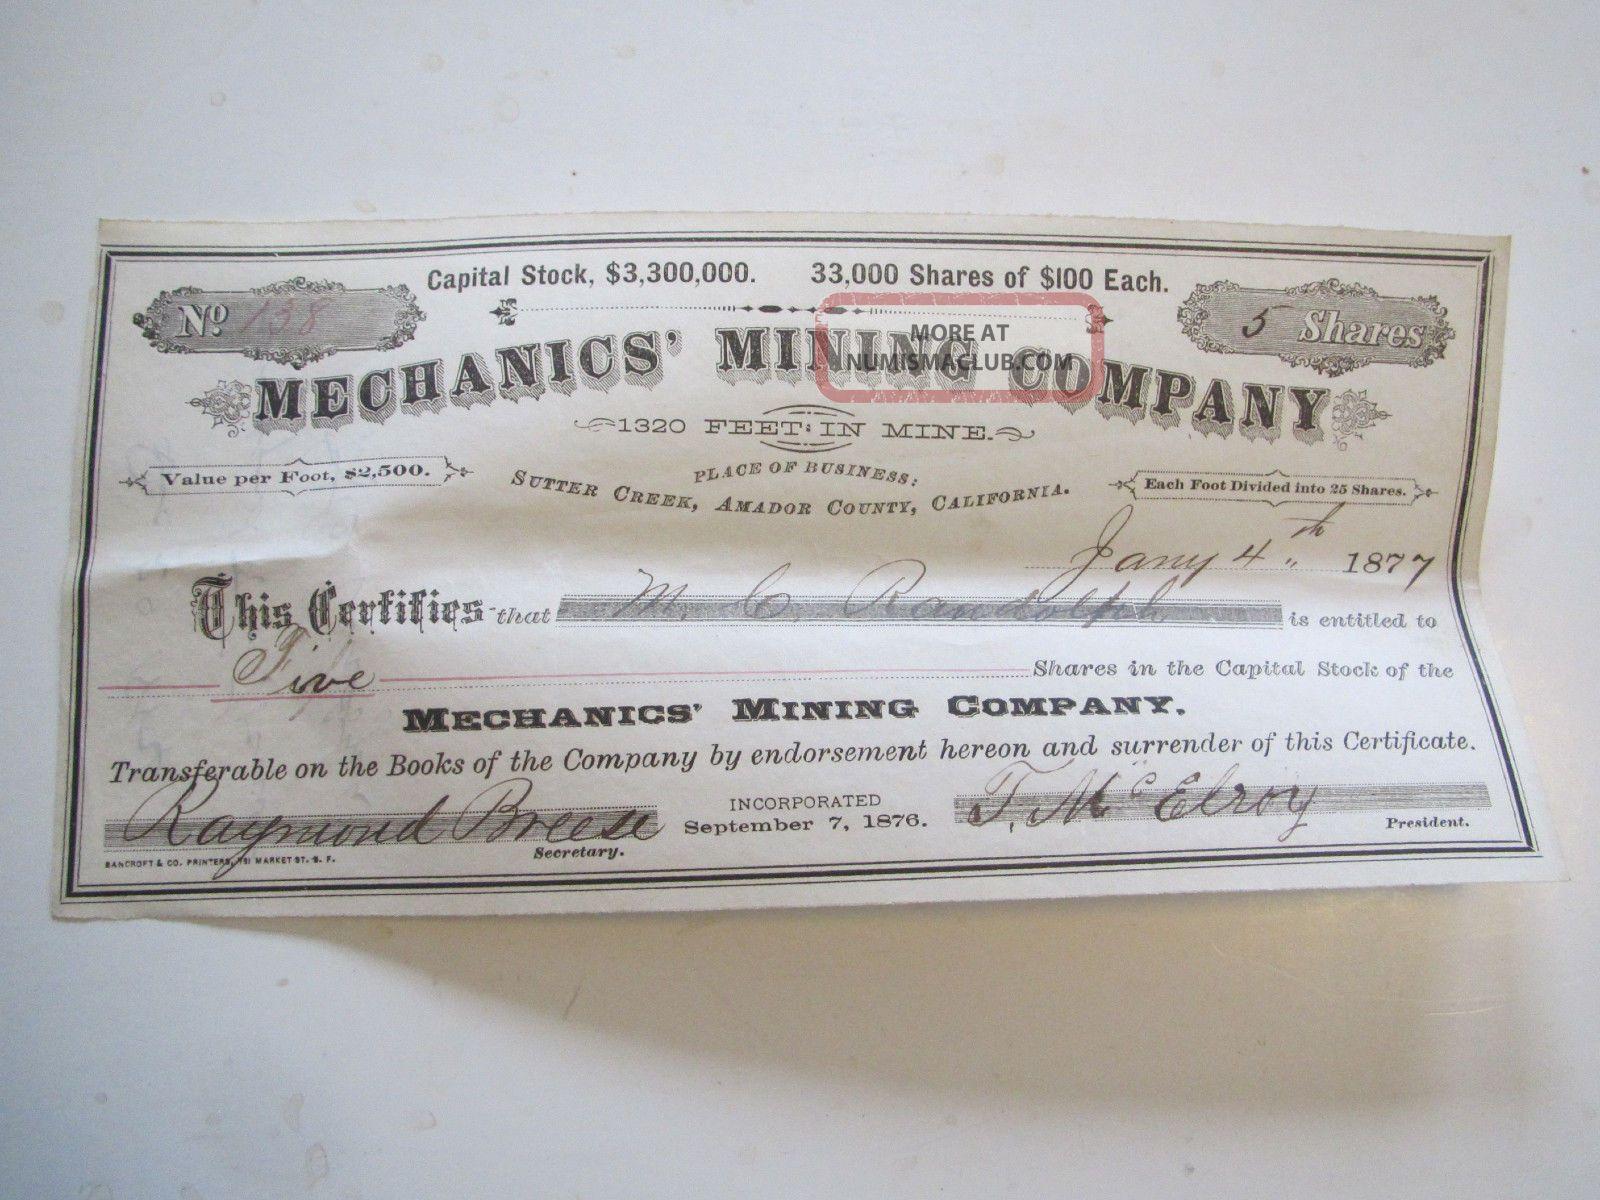 Mechanics Mining Co Sutter Creek Ca Five Shares Stock Certificate 1877 Stocks & Bonds, Scripophily photo